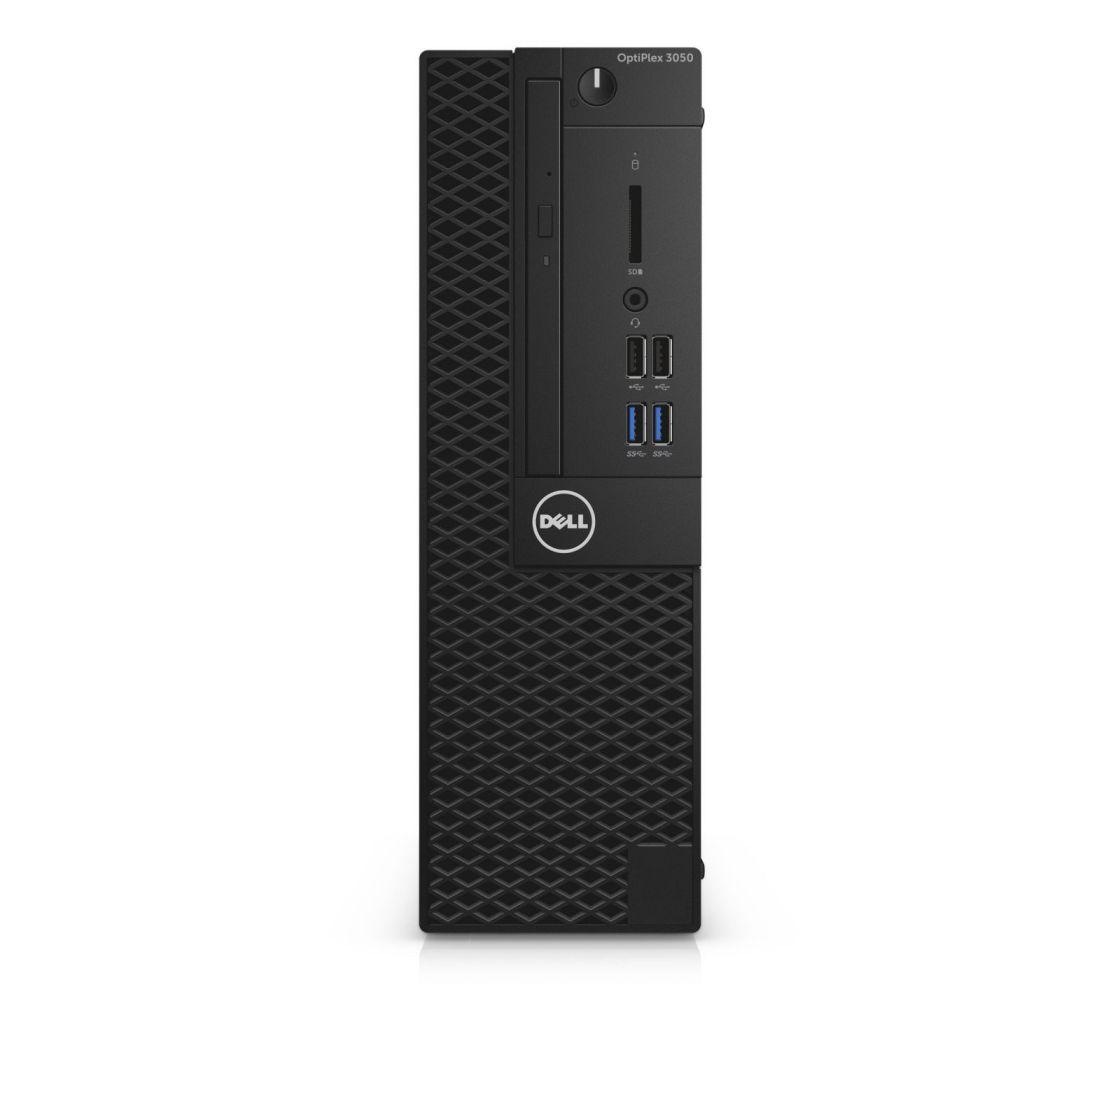 Dell Optiplex 3050 3f0hf